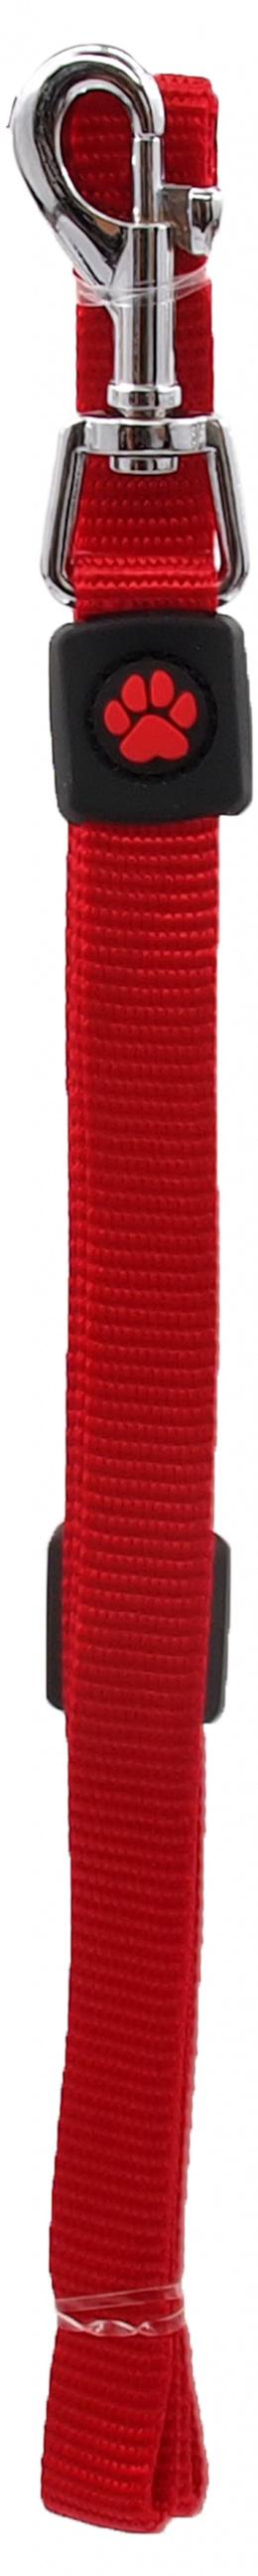 Vodítko Active Dog Premium S červené 1,5x120cm